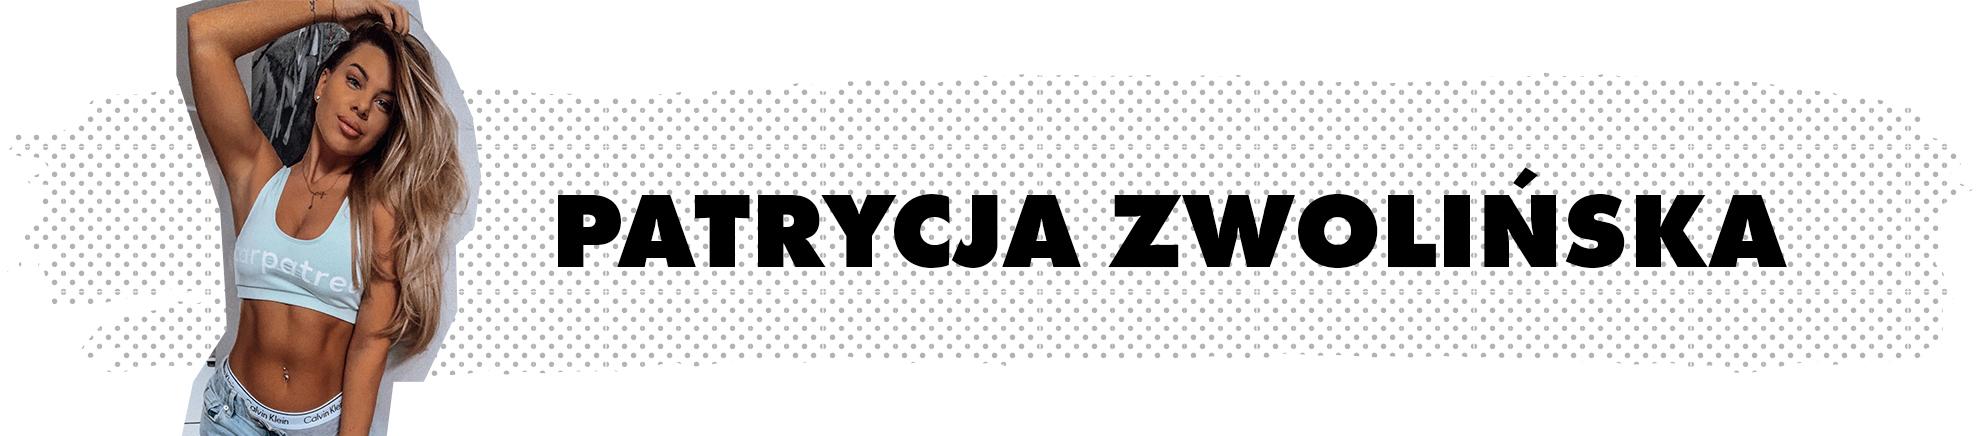 Patrycja Zwolińska - Carpatree brand ambassador